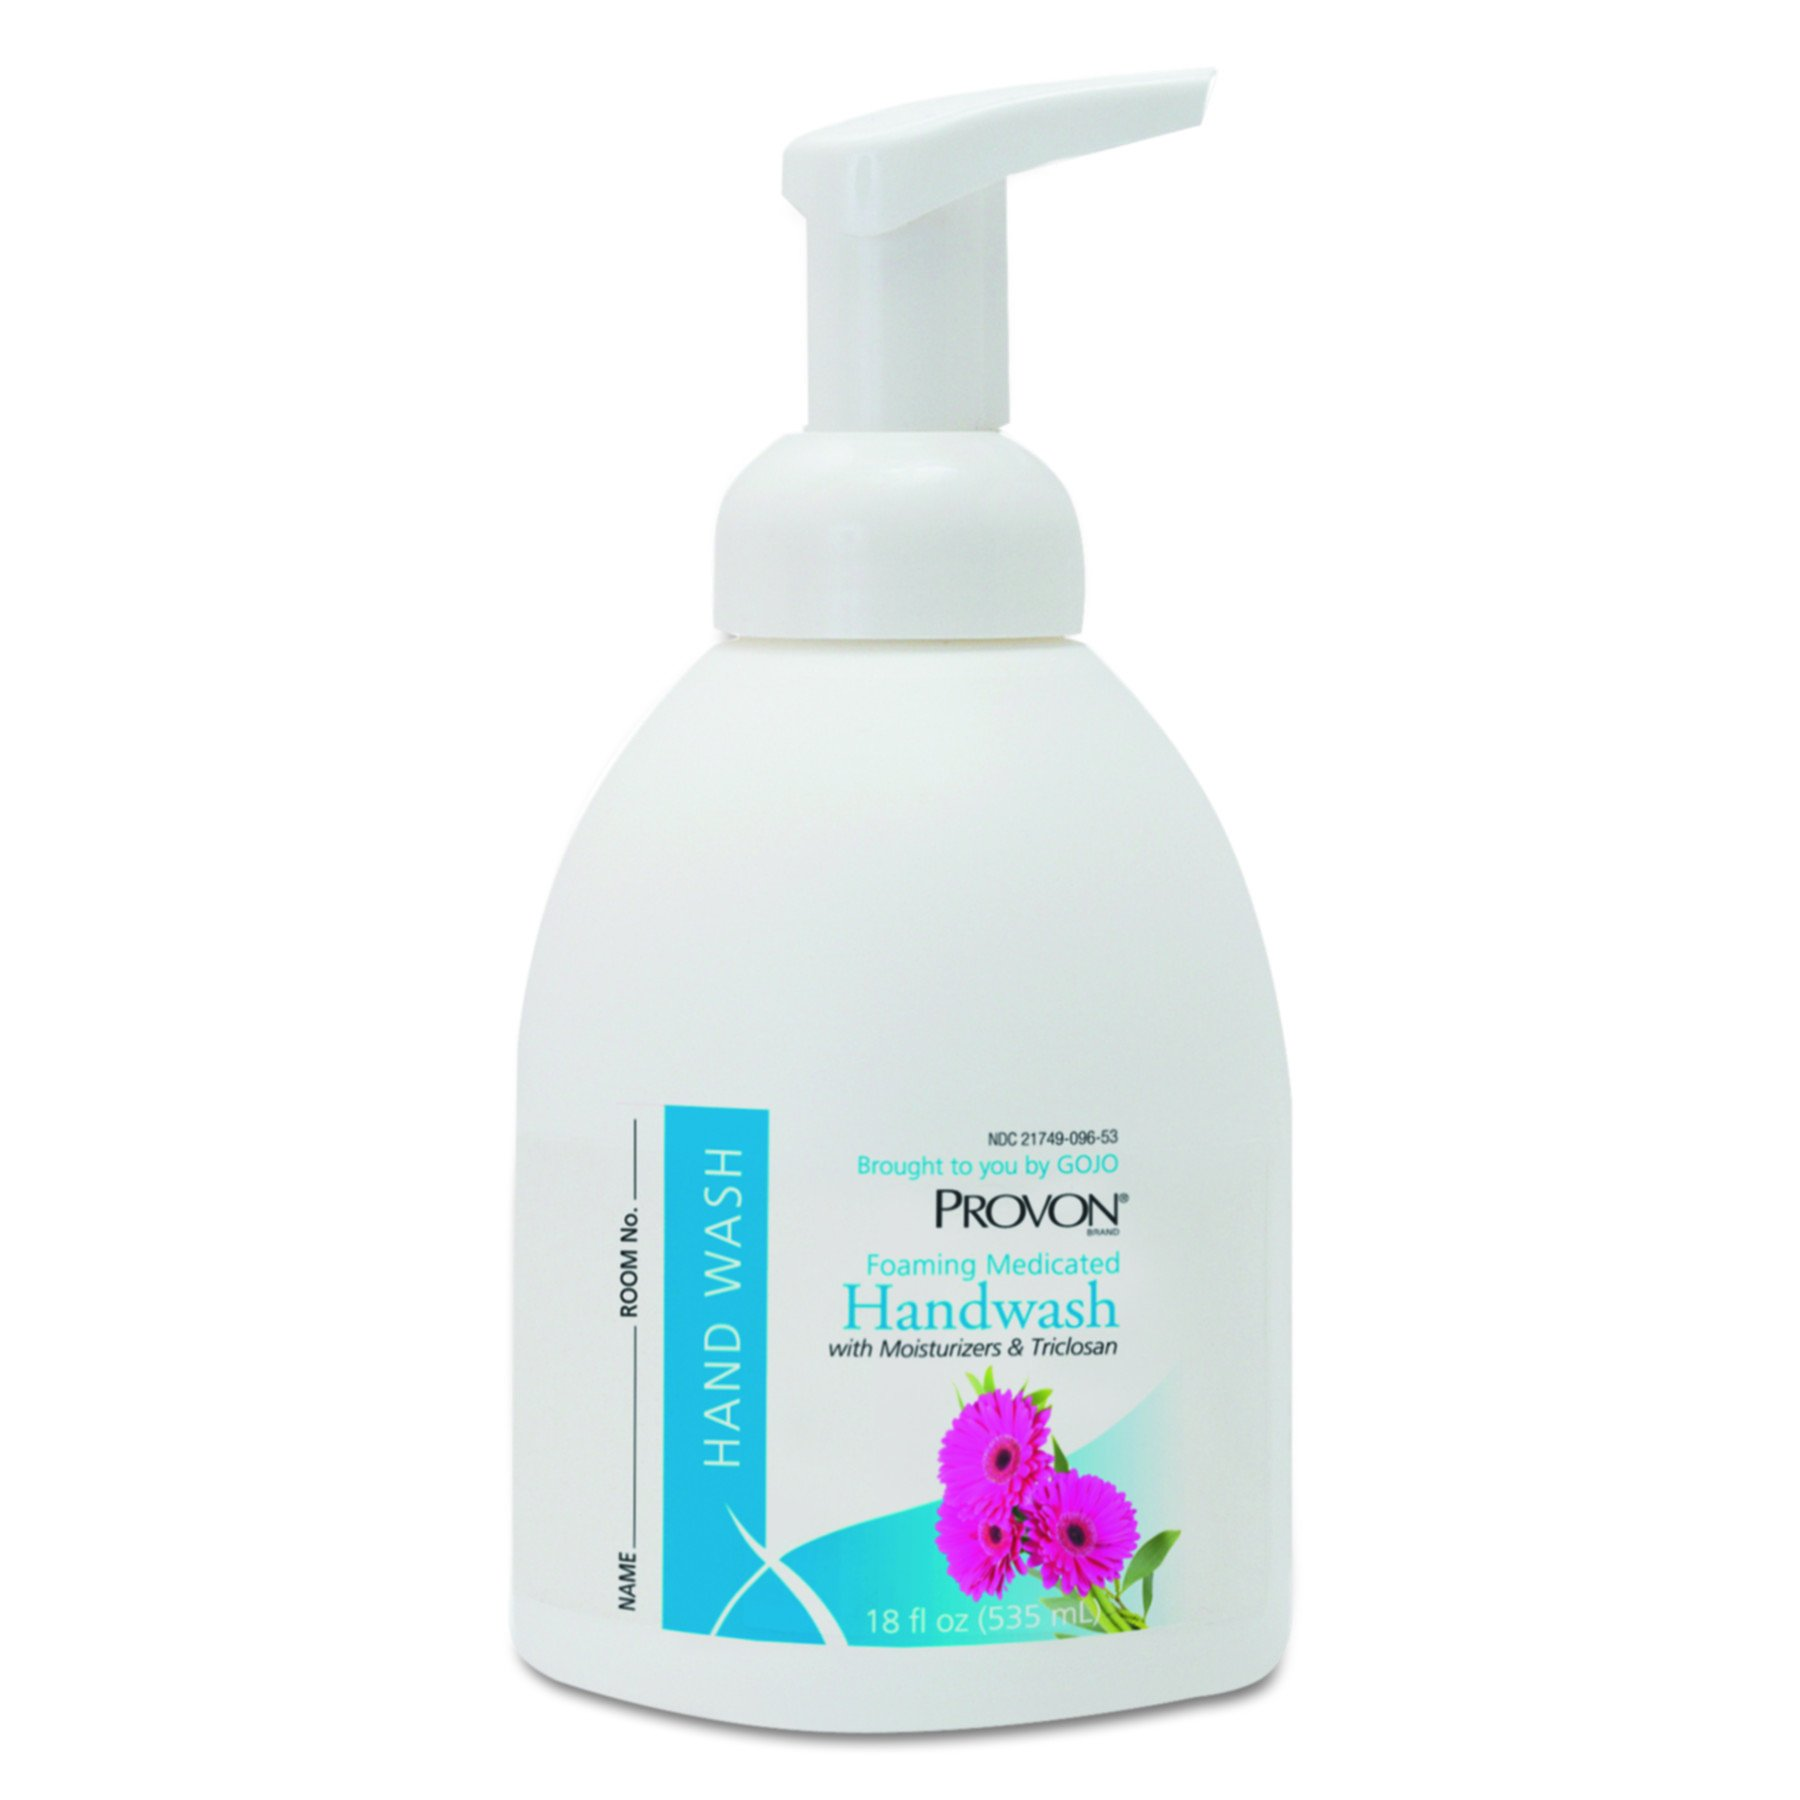 PROVON 578804 Foaming Medicated Handwash w/Moisturizers, Lightly Scented, 18oz Pump